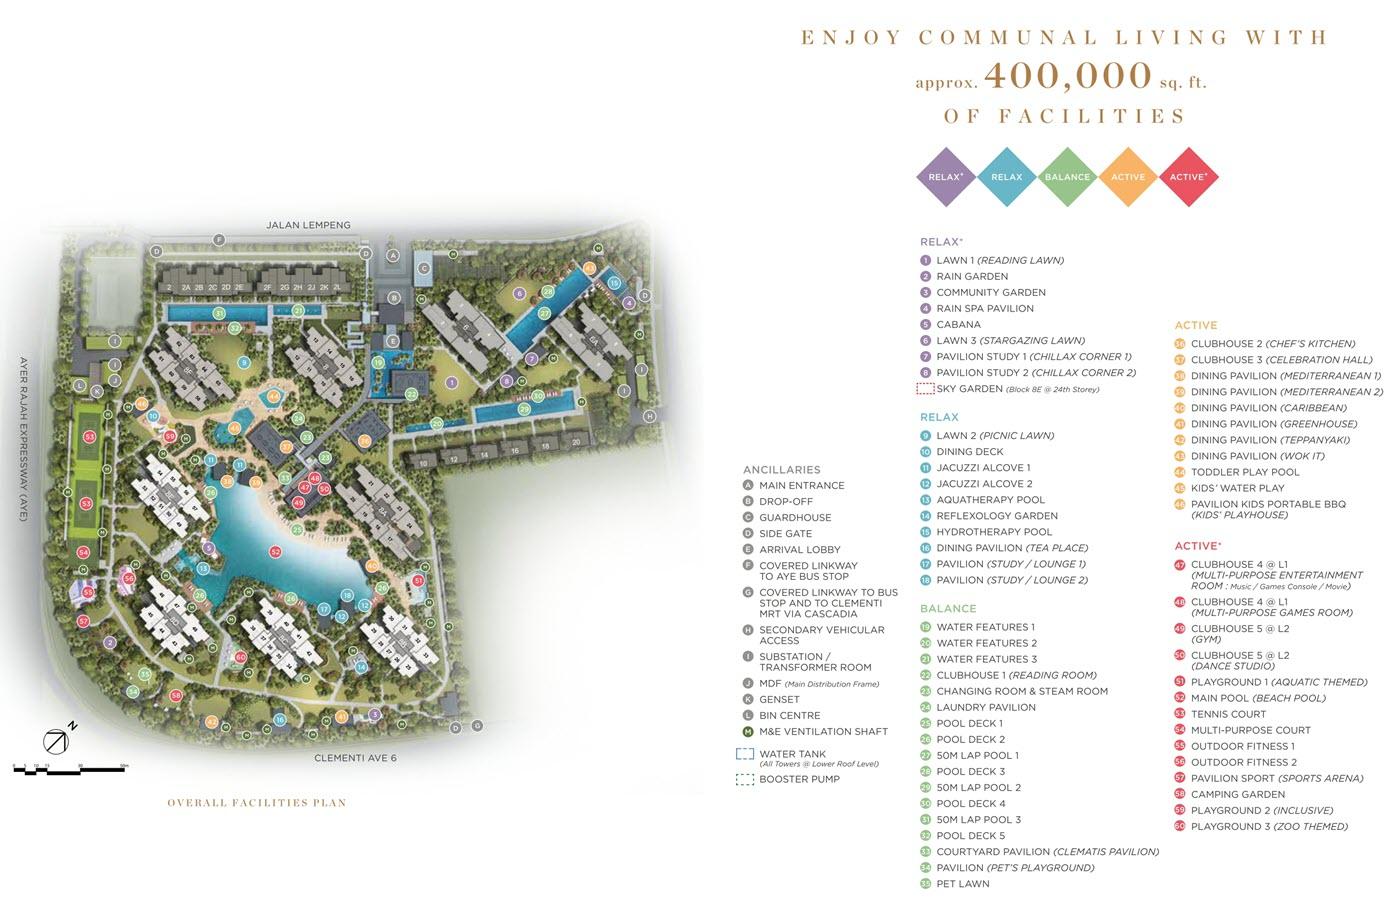 Parc Clematis Condo Site Plan